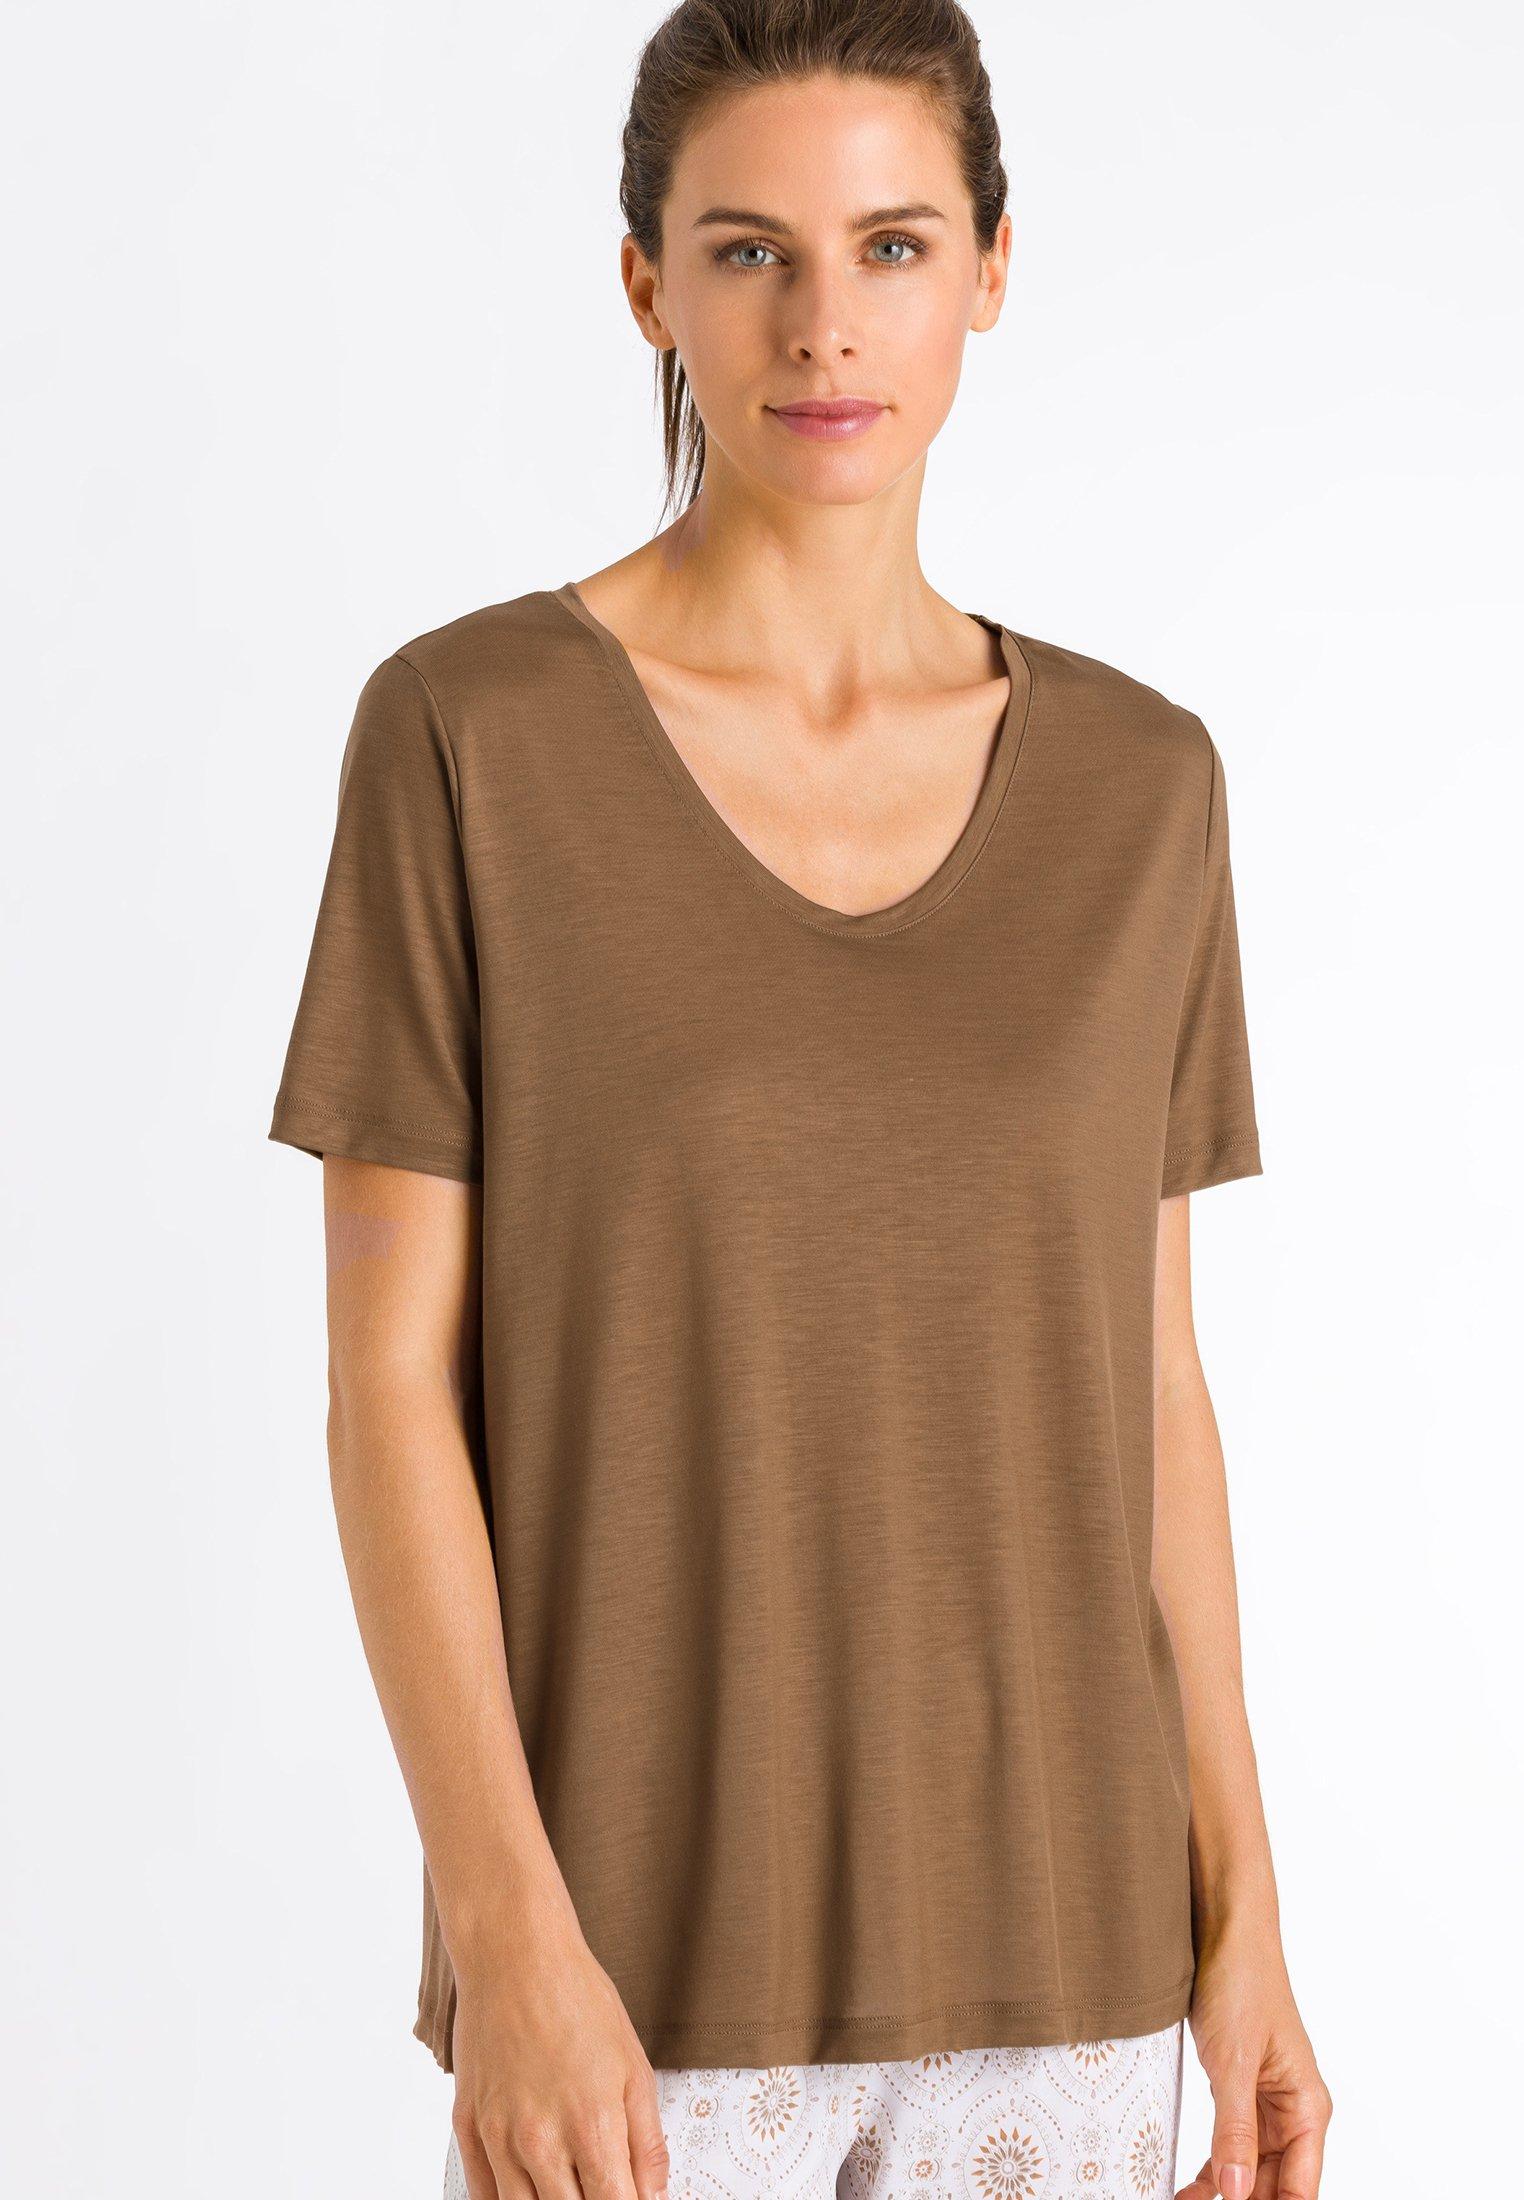 Damen BALANCE - Nachtwäsche Shirt